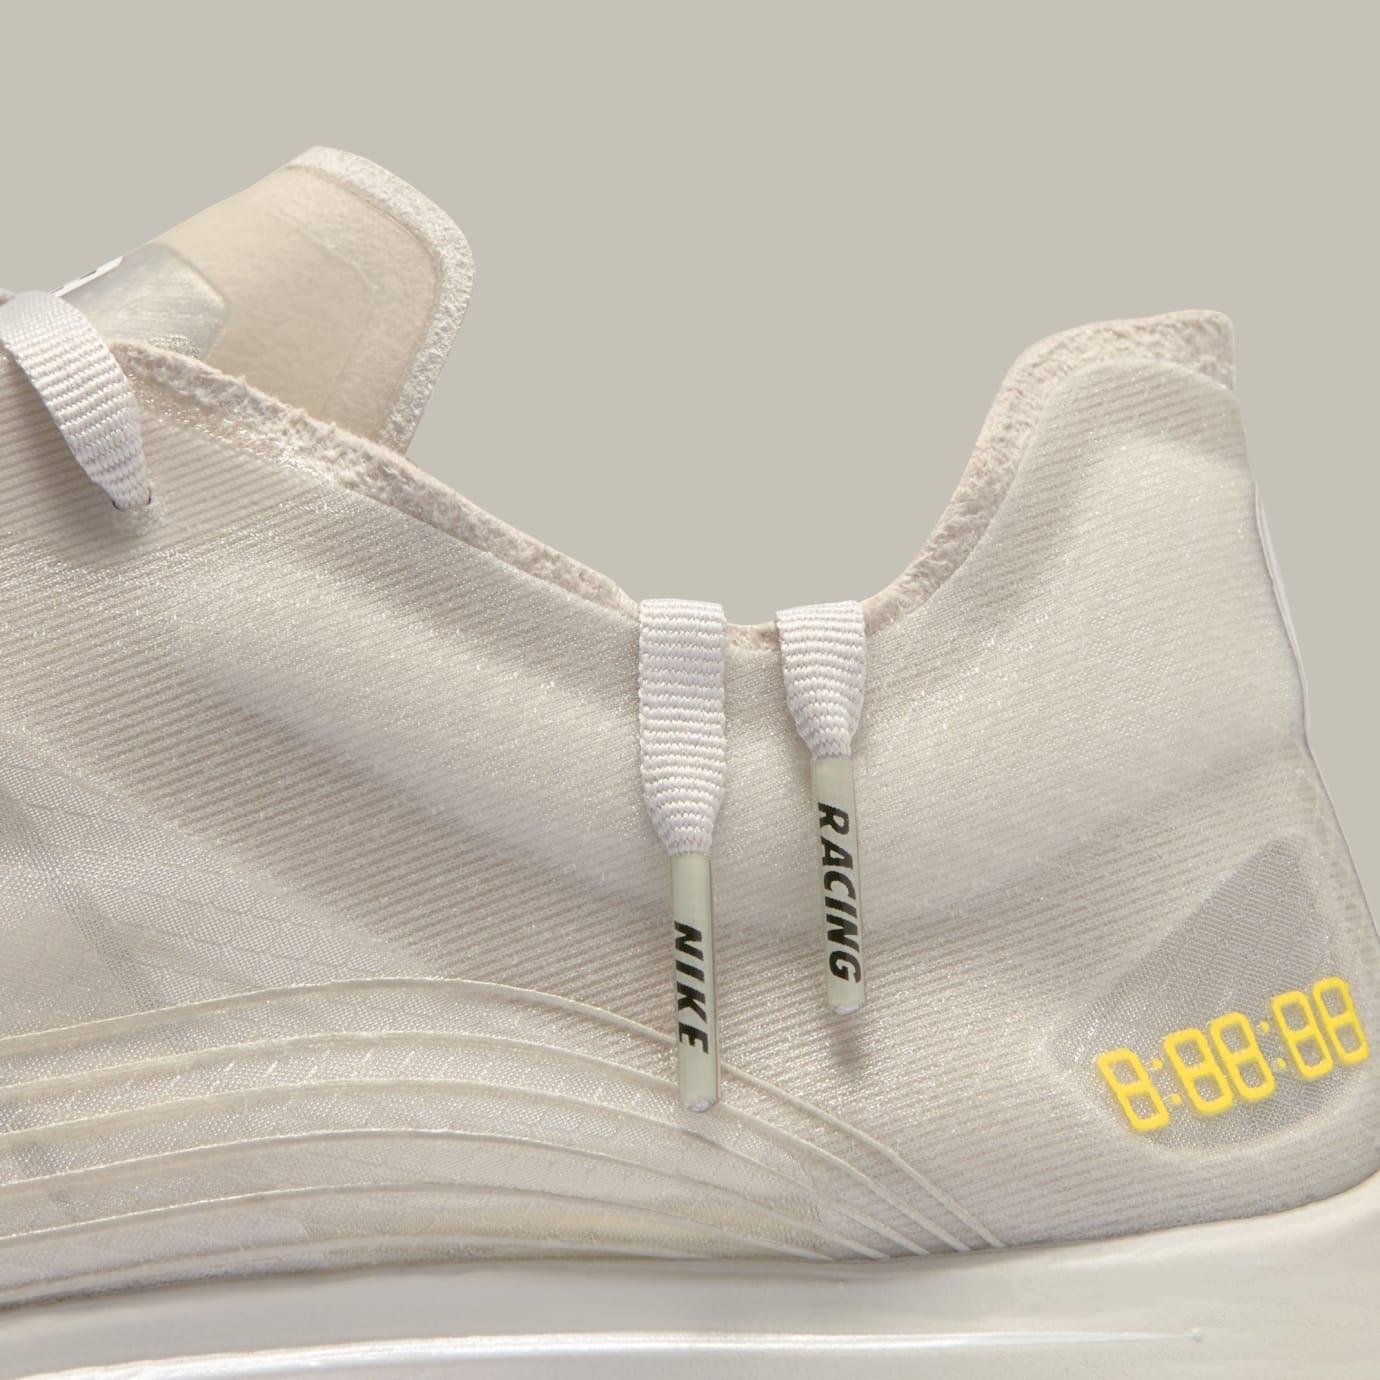 Nike Zoom Fly SP 'Light Bone' AJ9282-001 (Detail)